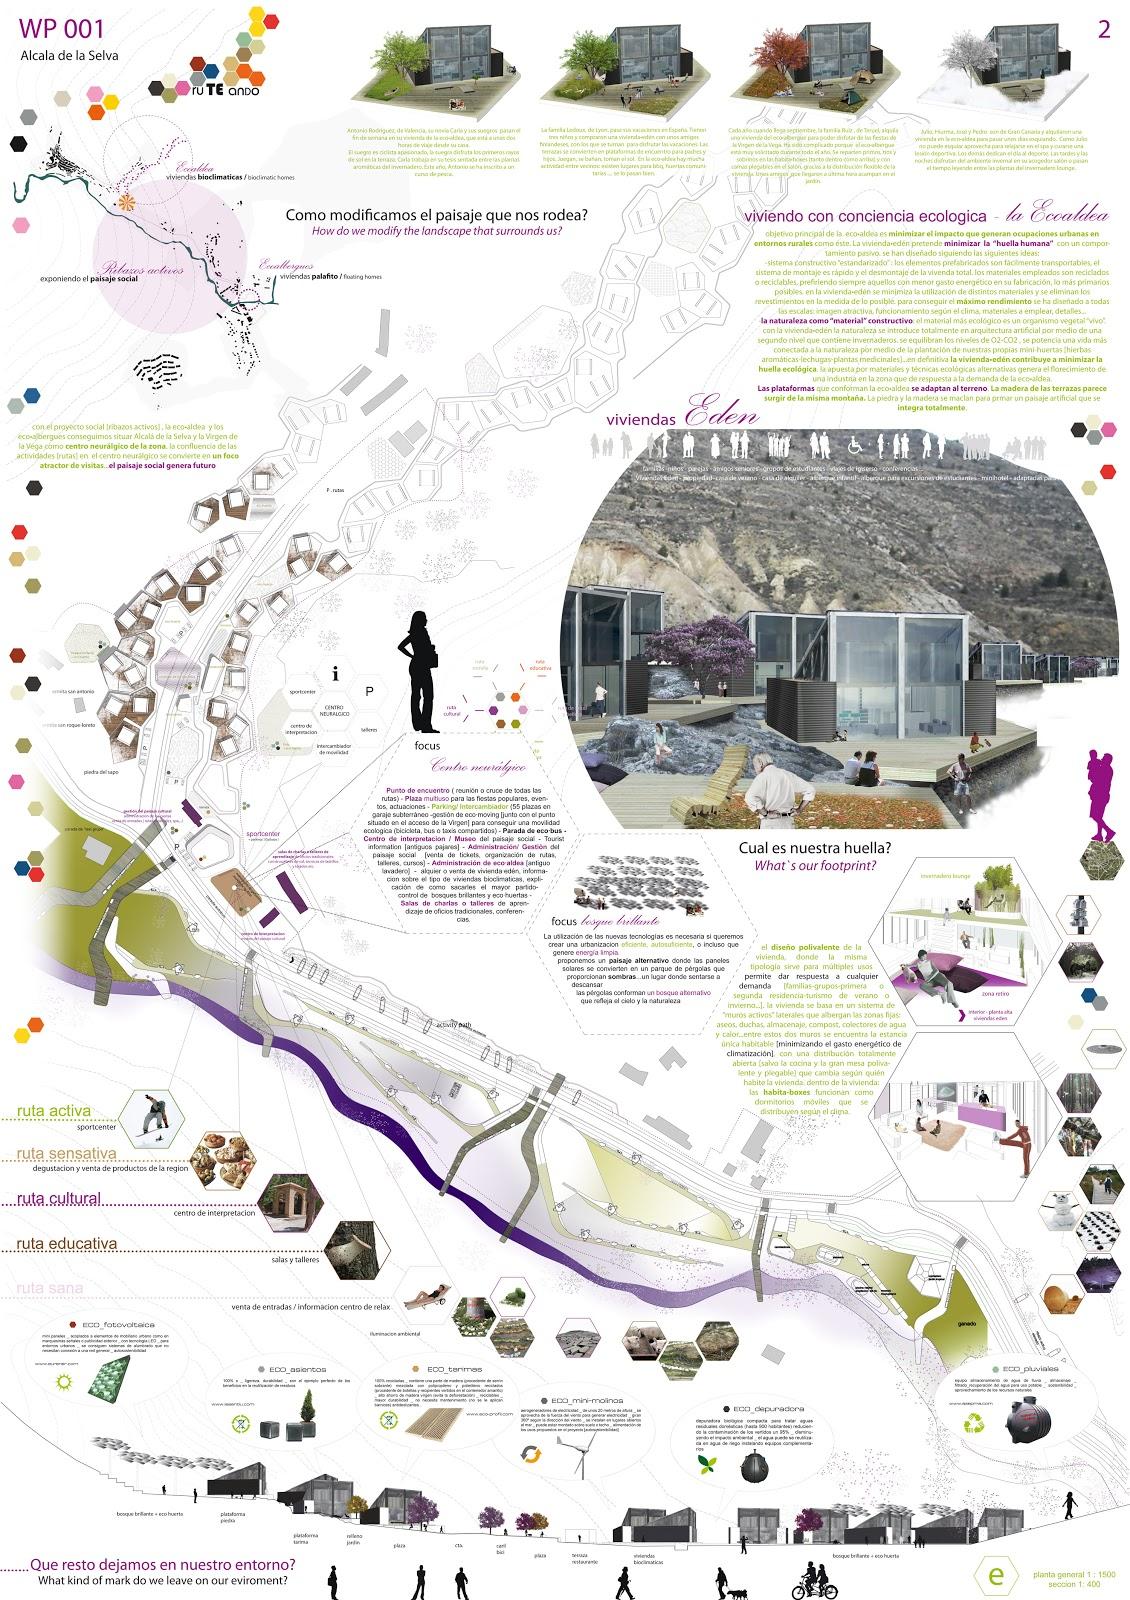 Nairagallardoruiz arquitectura planificaci n cultural for Conceptualizacion de la arquitectura